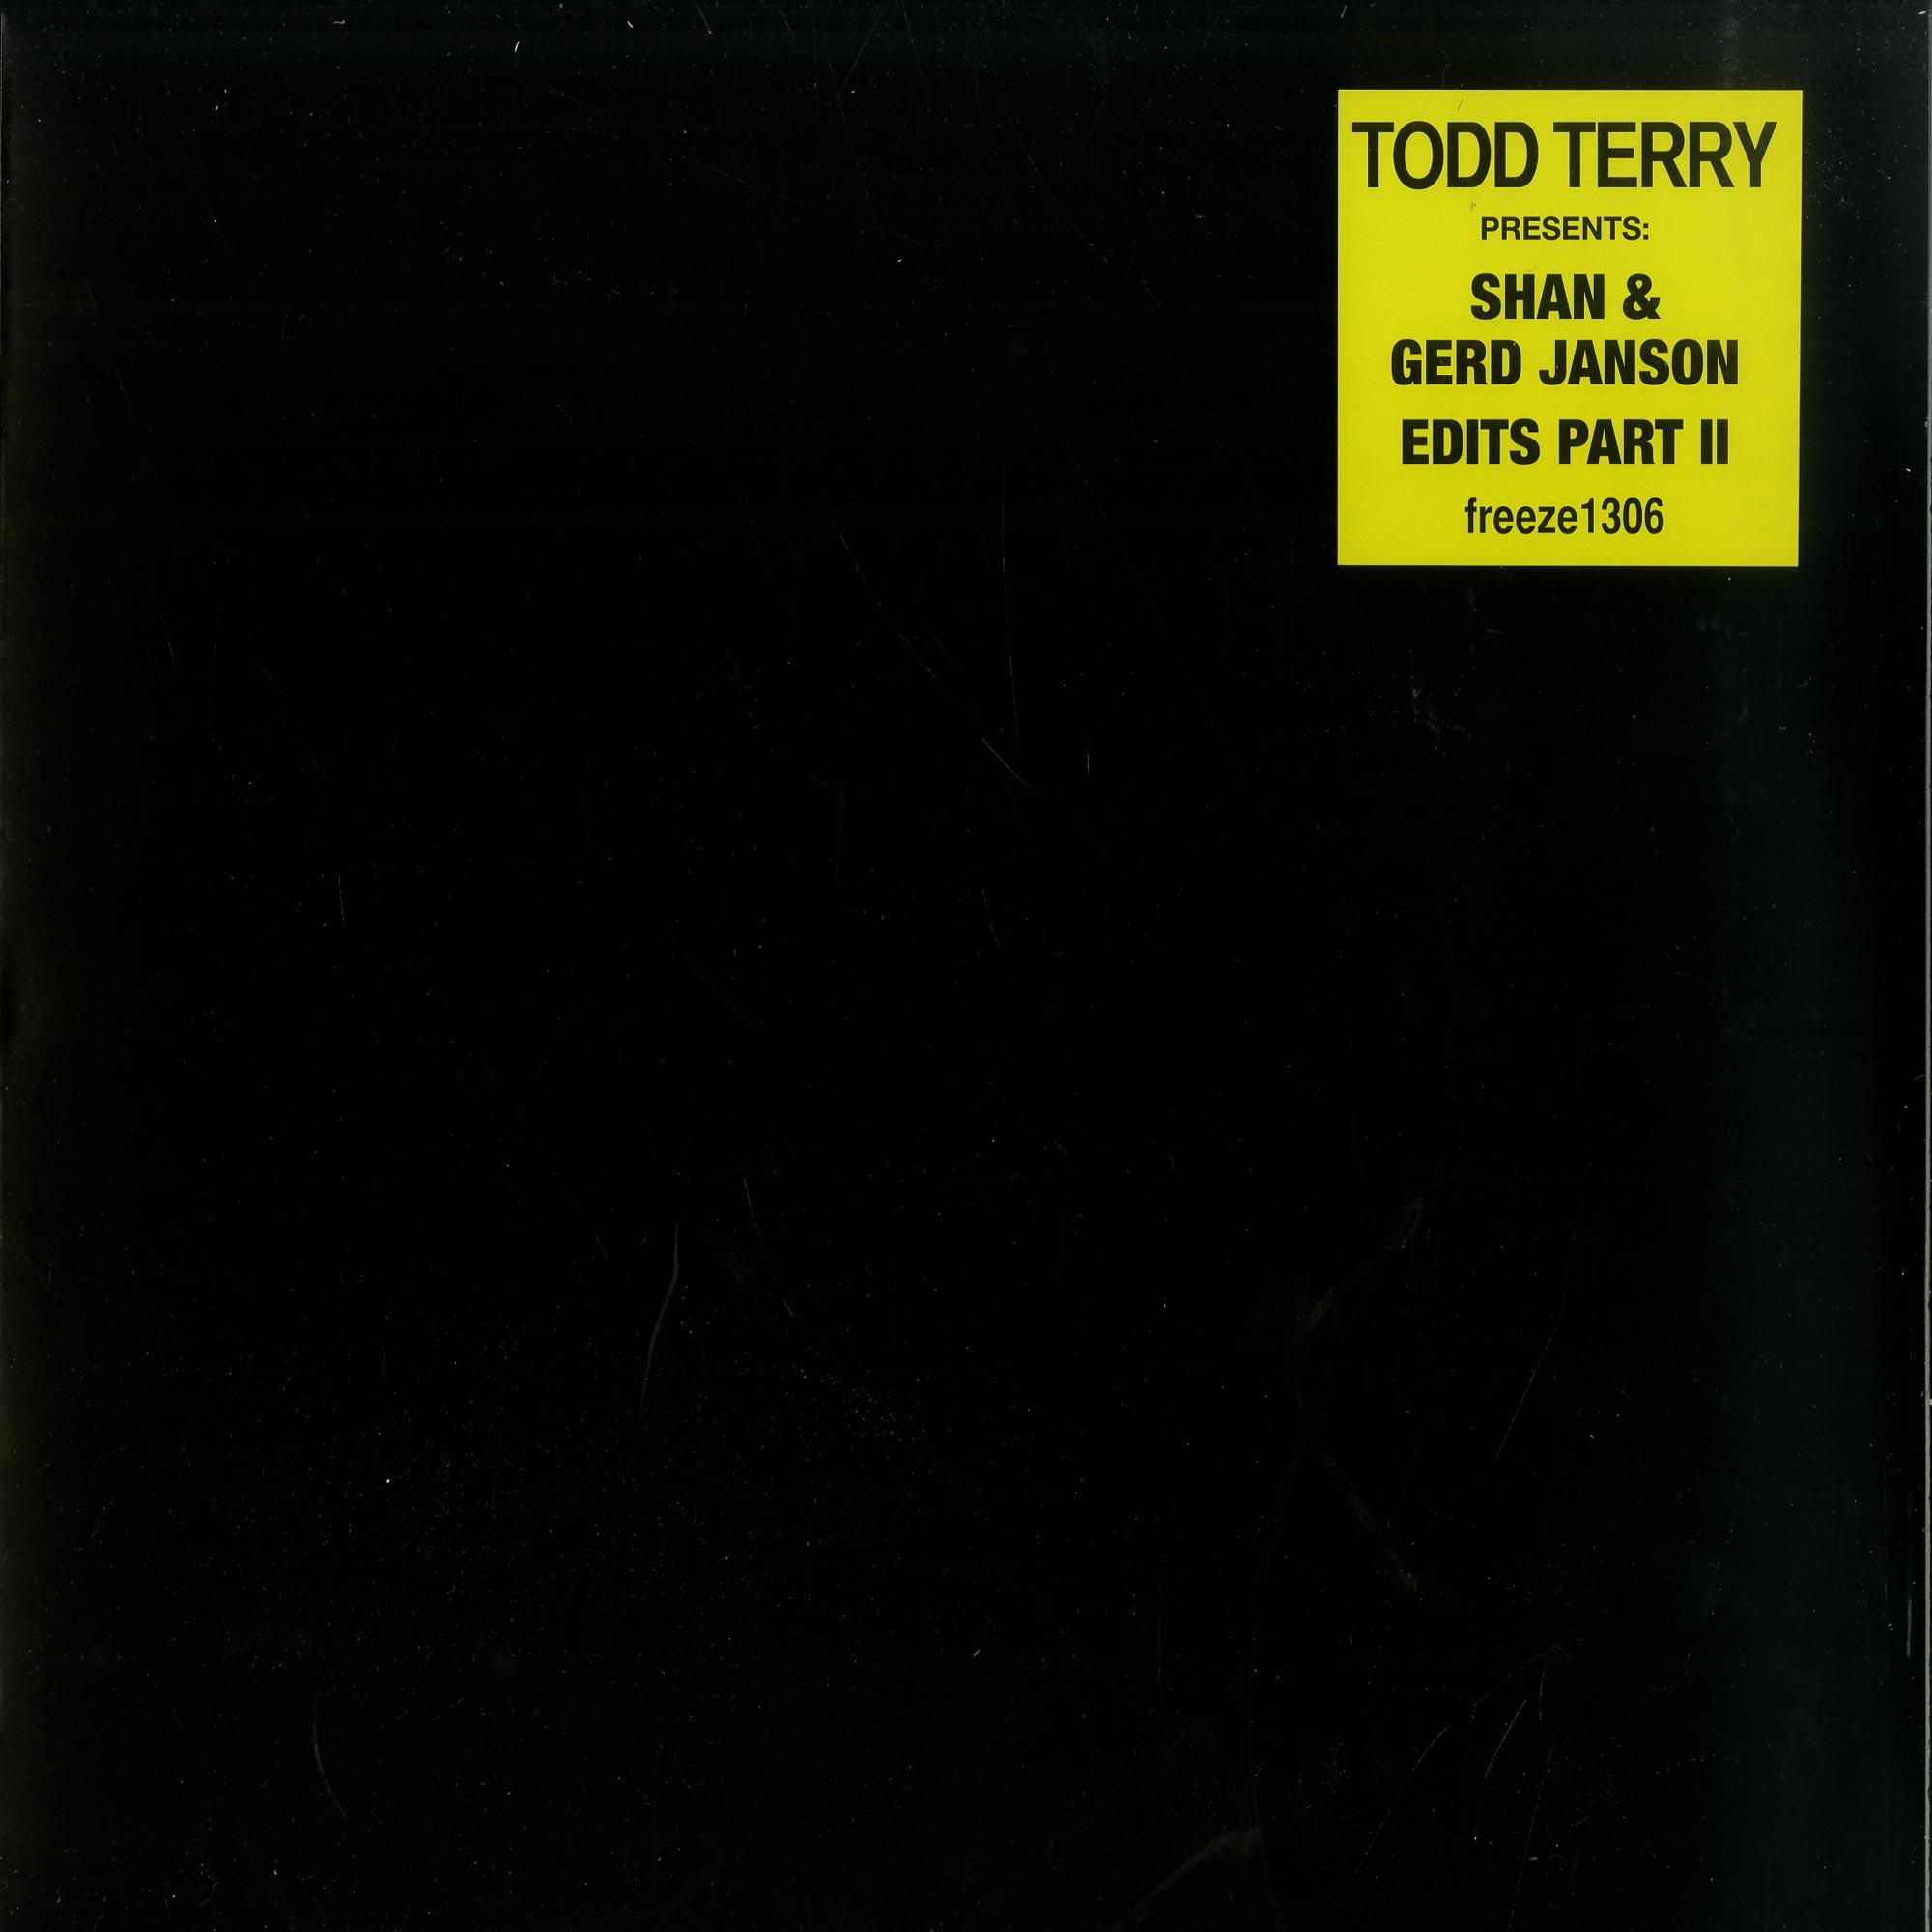 Todd Terry - TODD TERRY PRESENTS SHAN GERD JANSON EDITS VOL 2